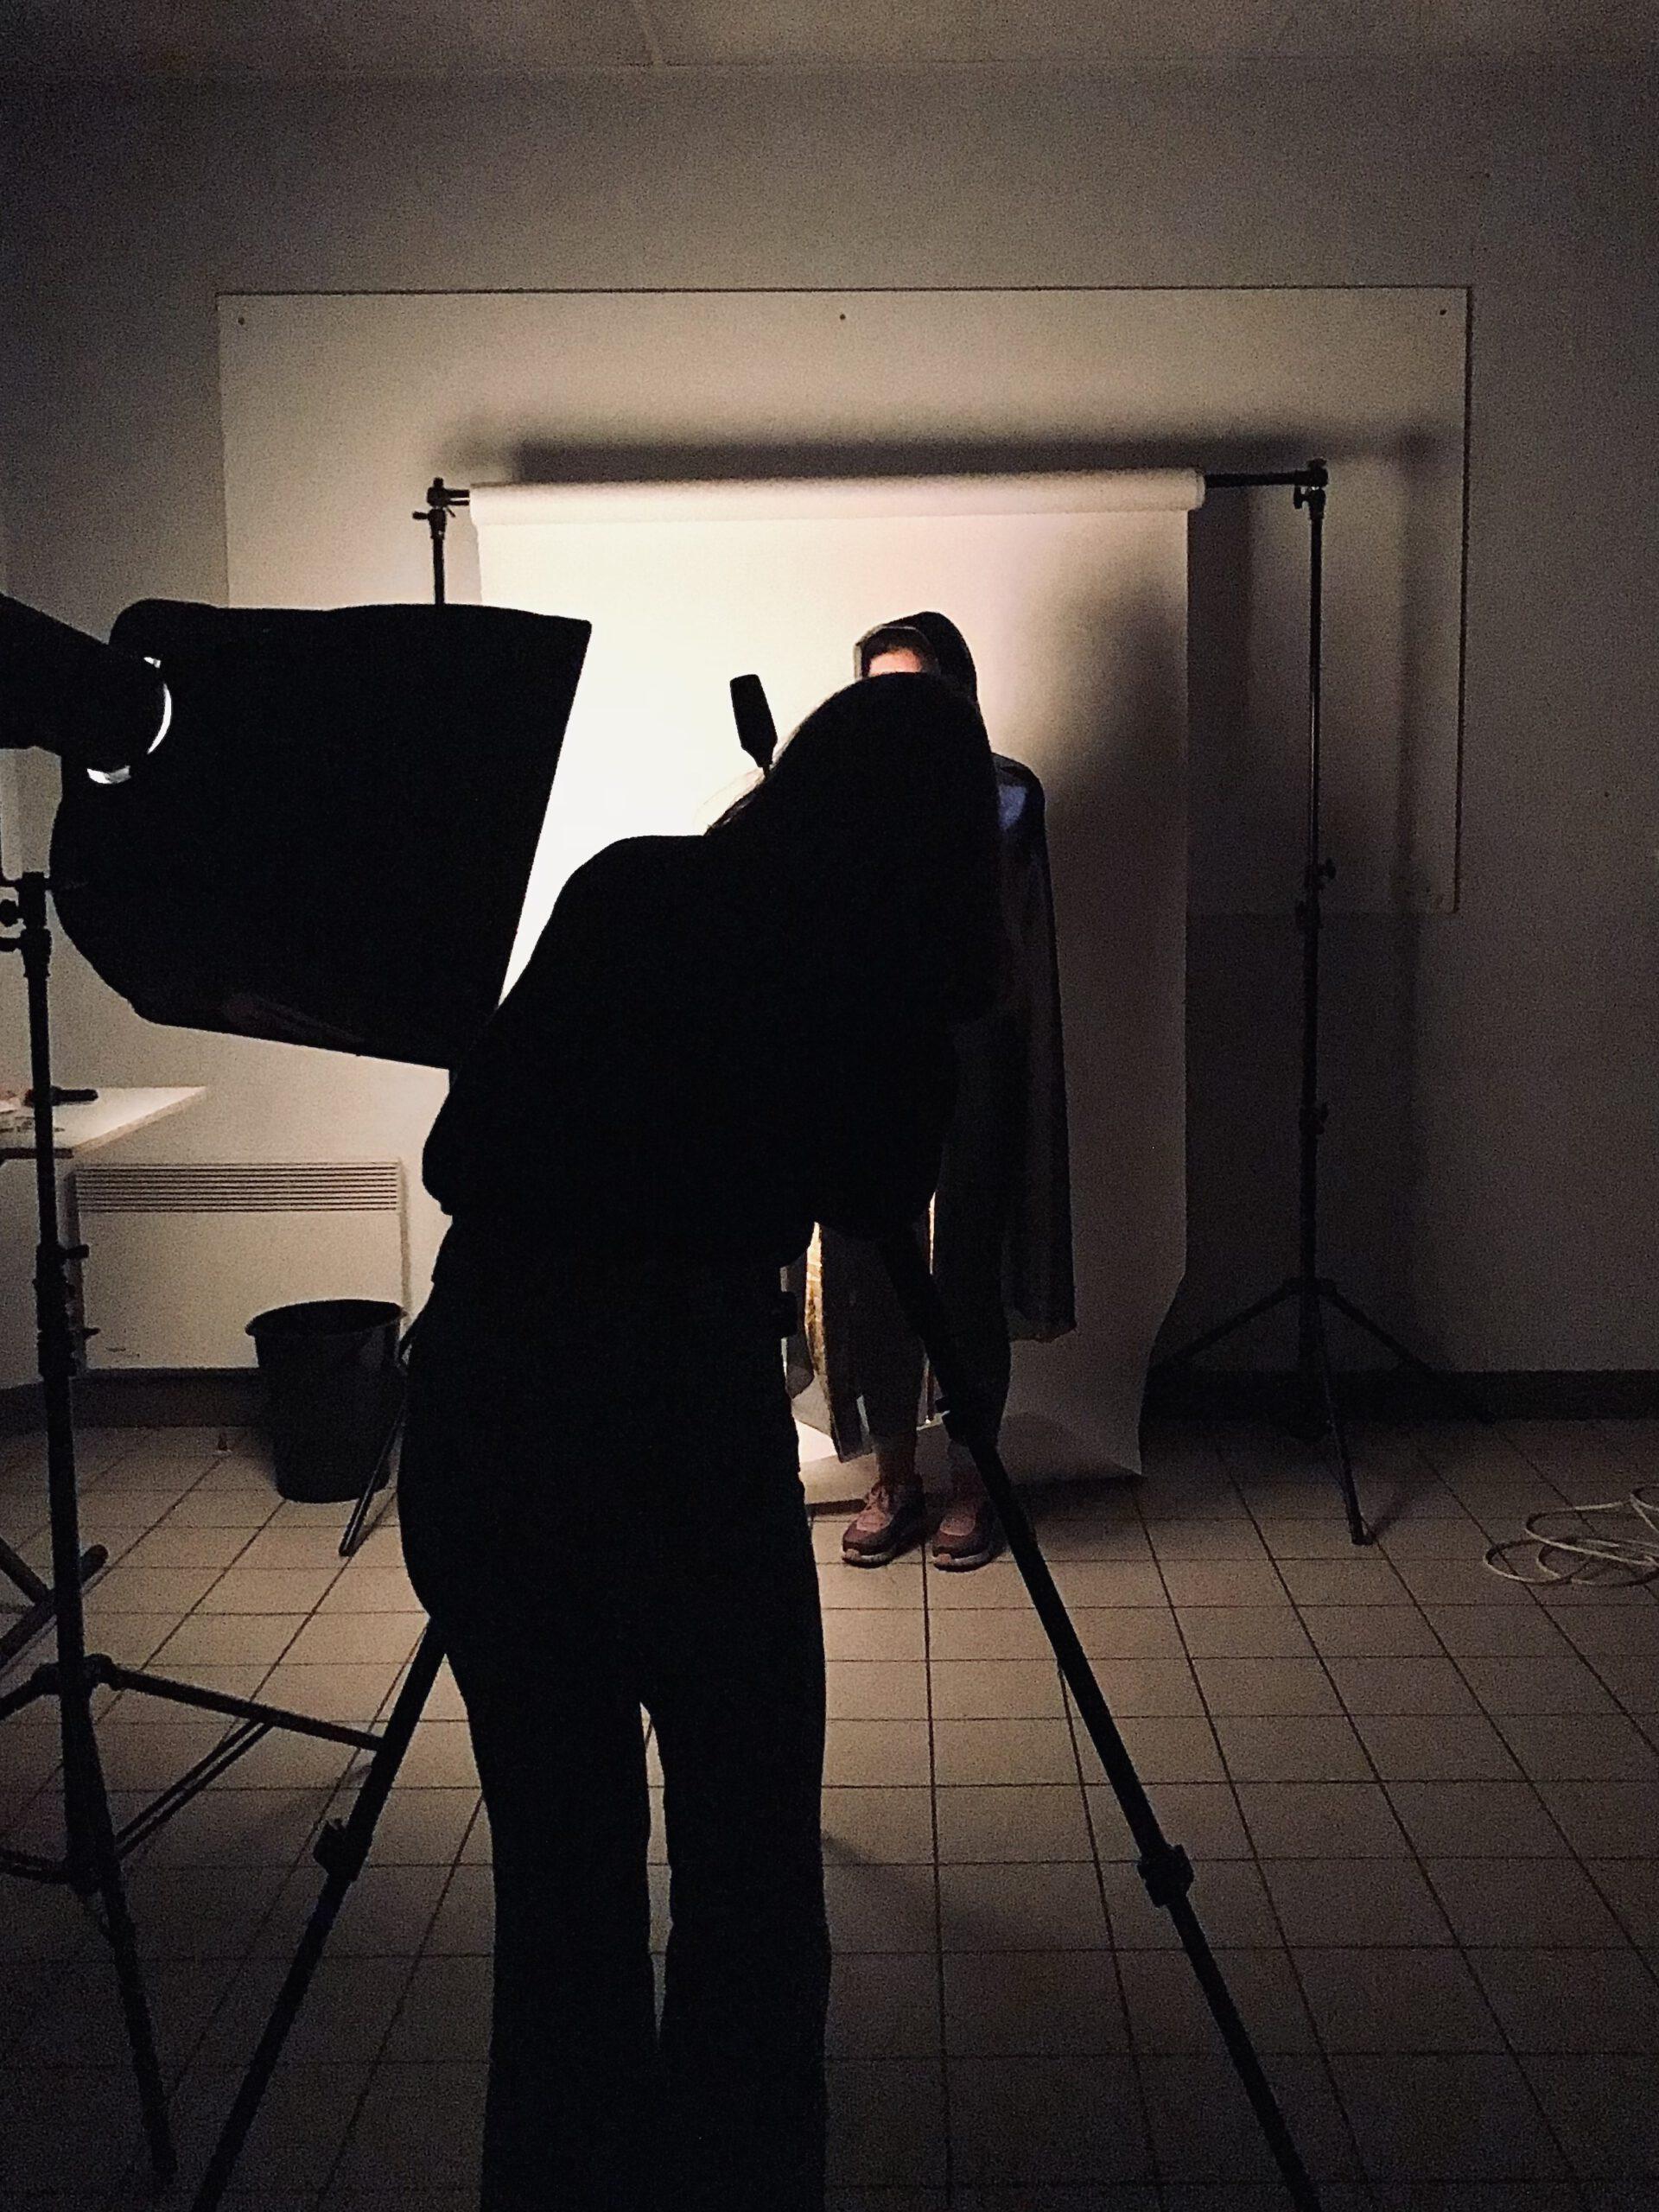 Studio - Bac Pro Photographie